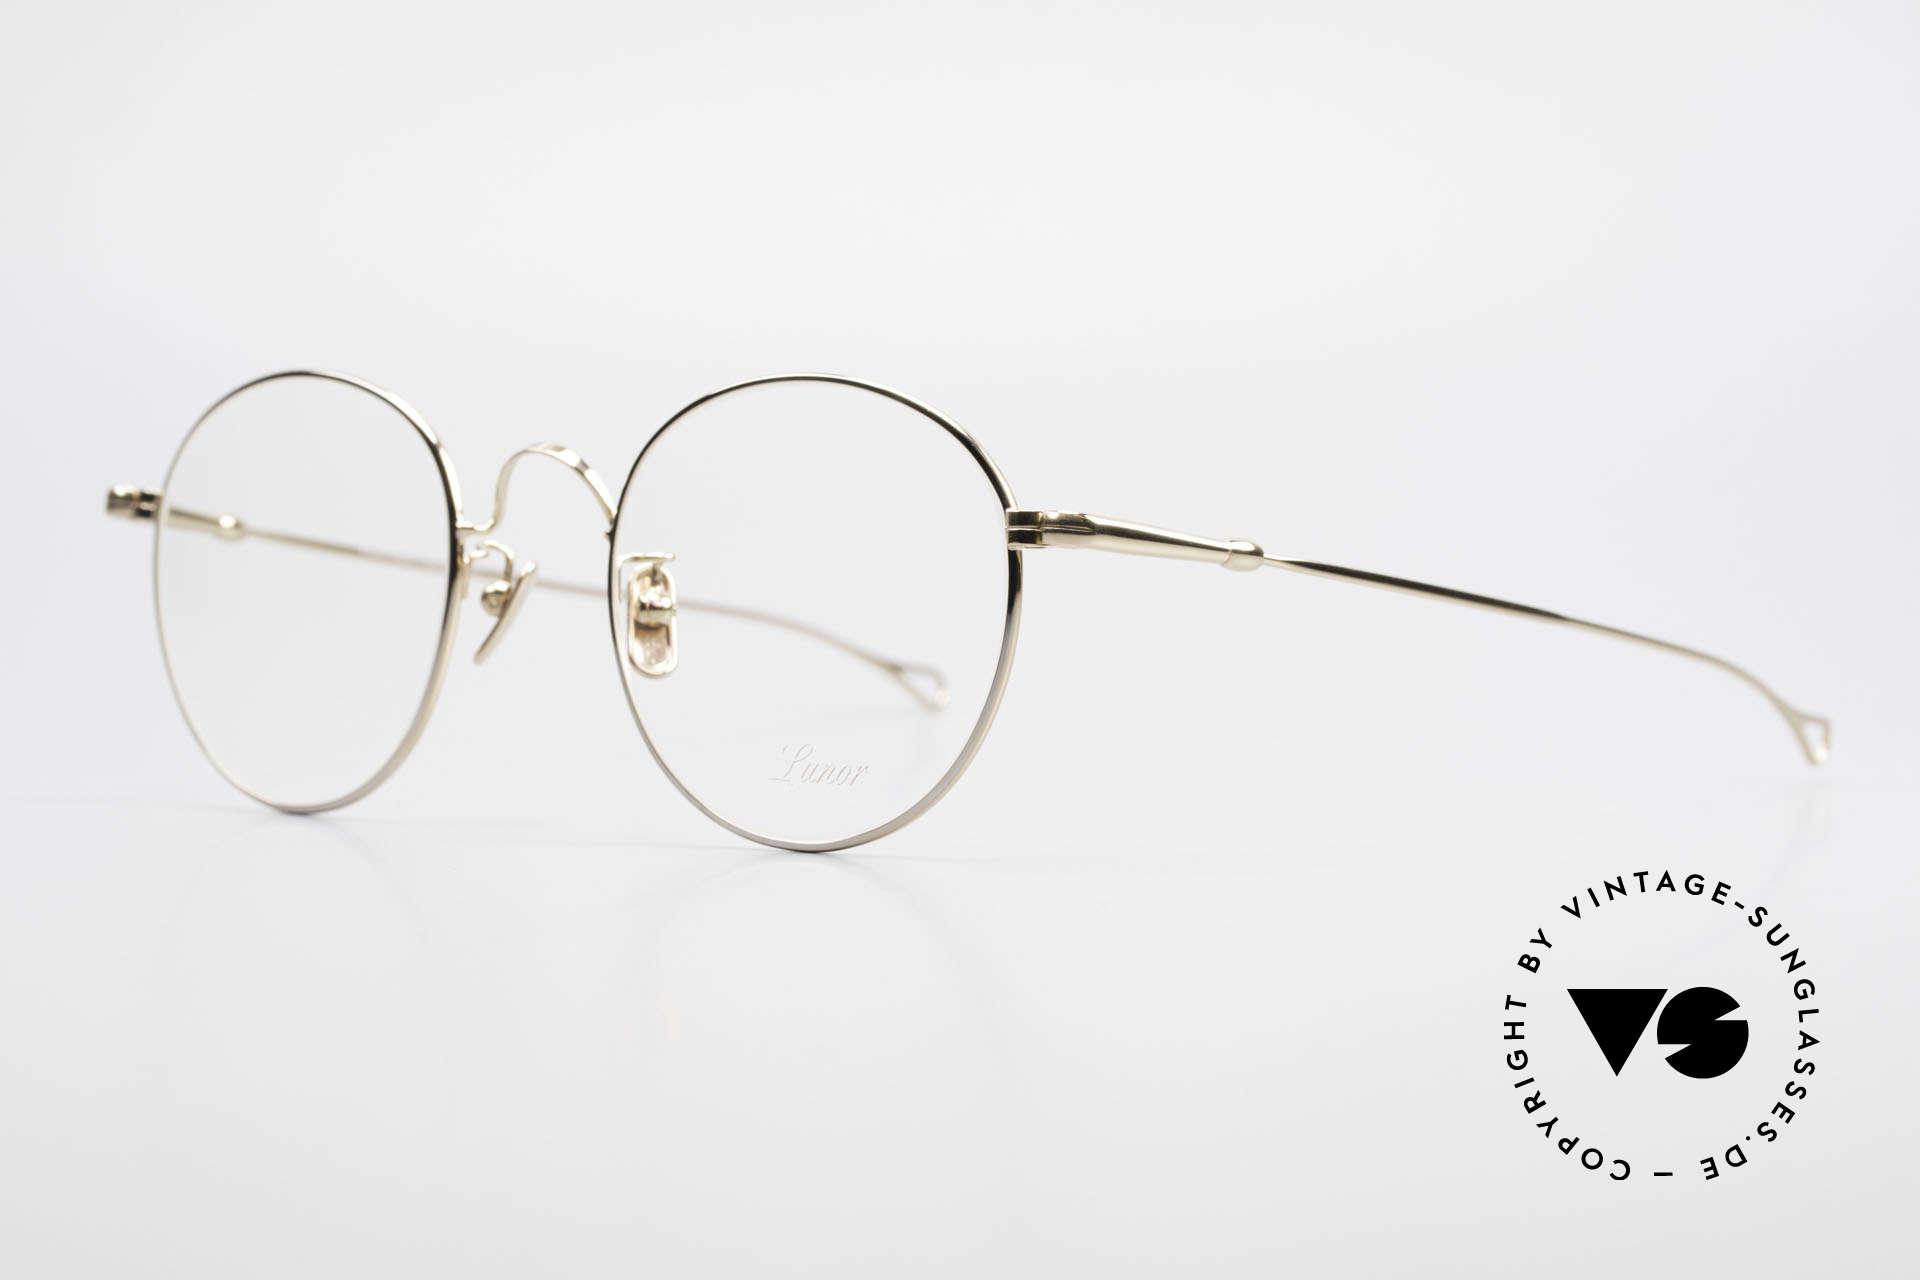 Lunor V 111 Men's Panto Frame Gold Plated, model V 111: gold-plated Panto glasses for gentlemen, Made for Men